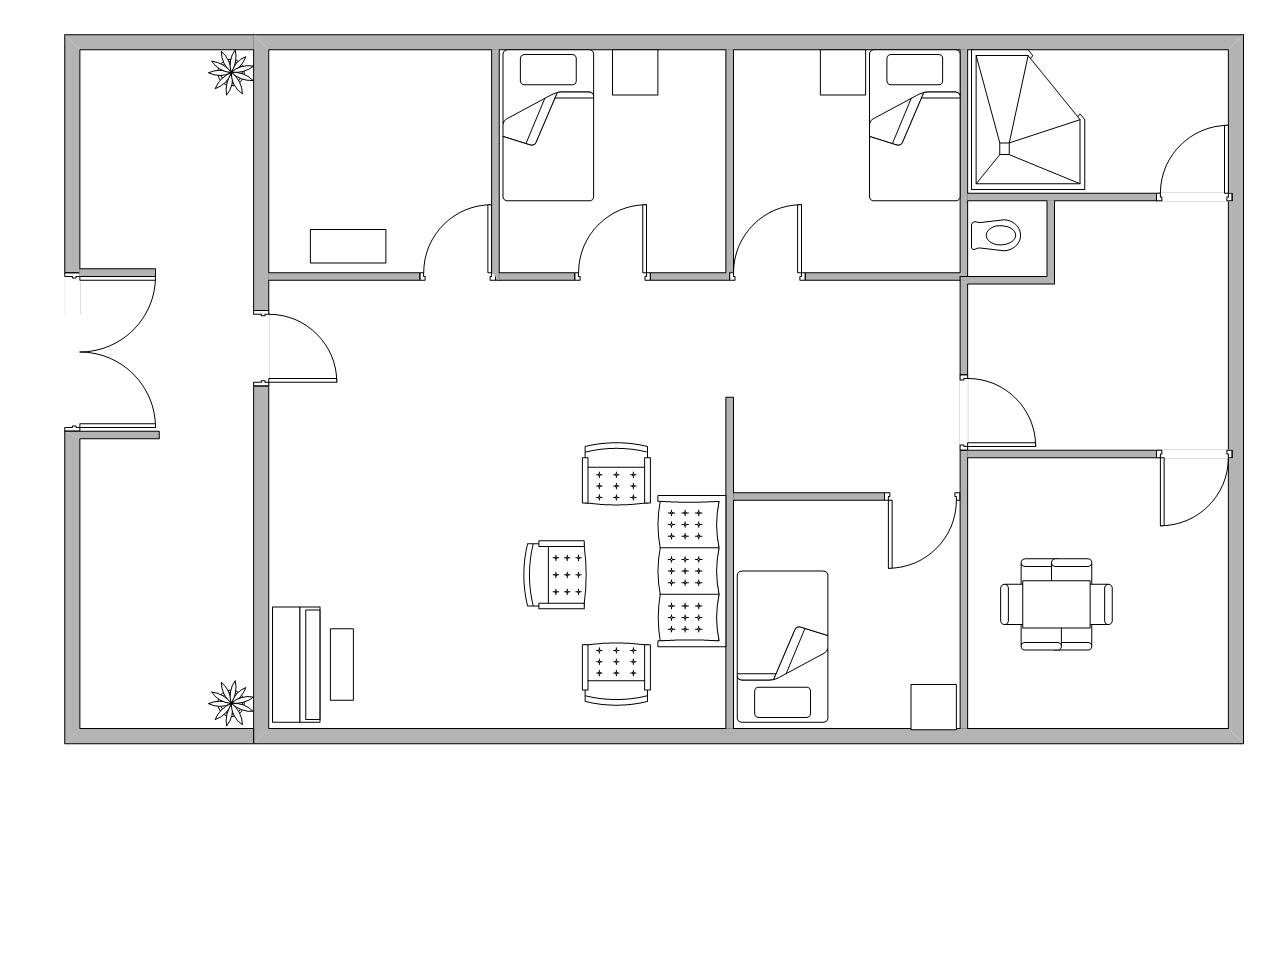 fabian vargas plano de mi casa fabian vargas On planos para mi casa